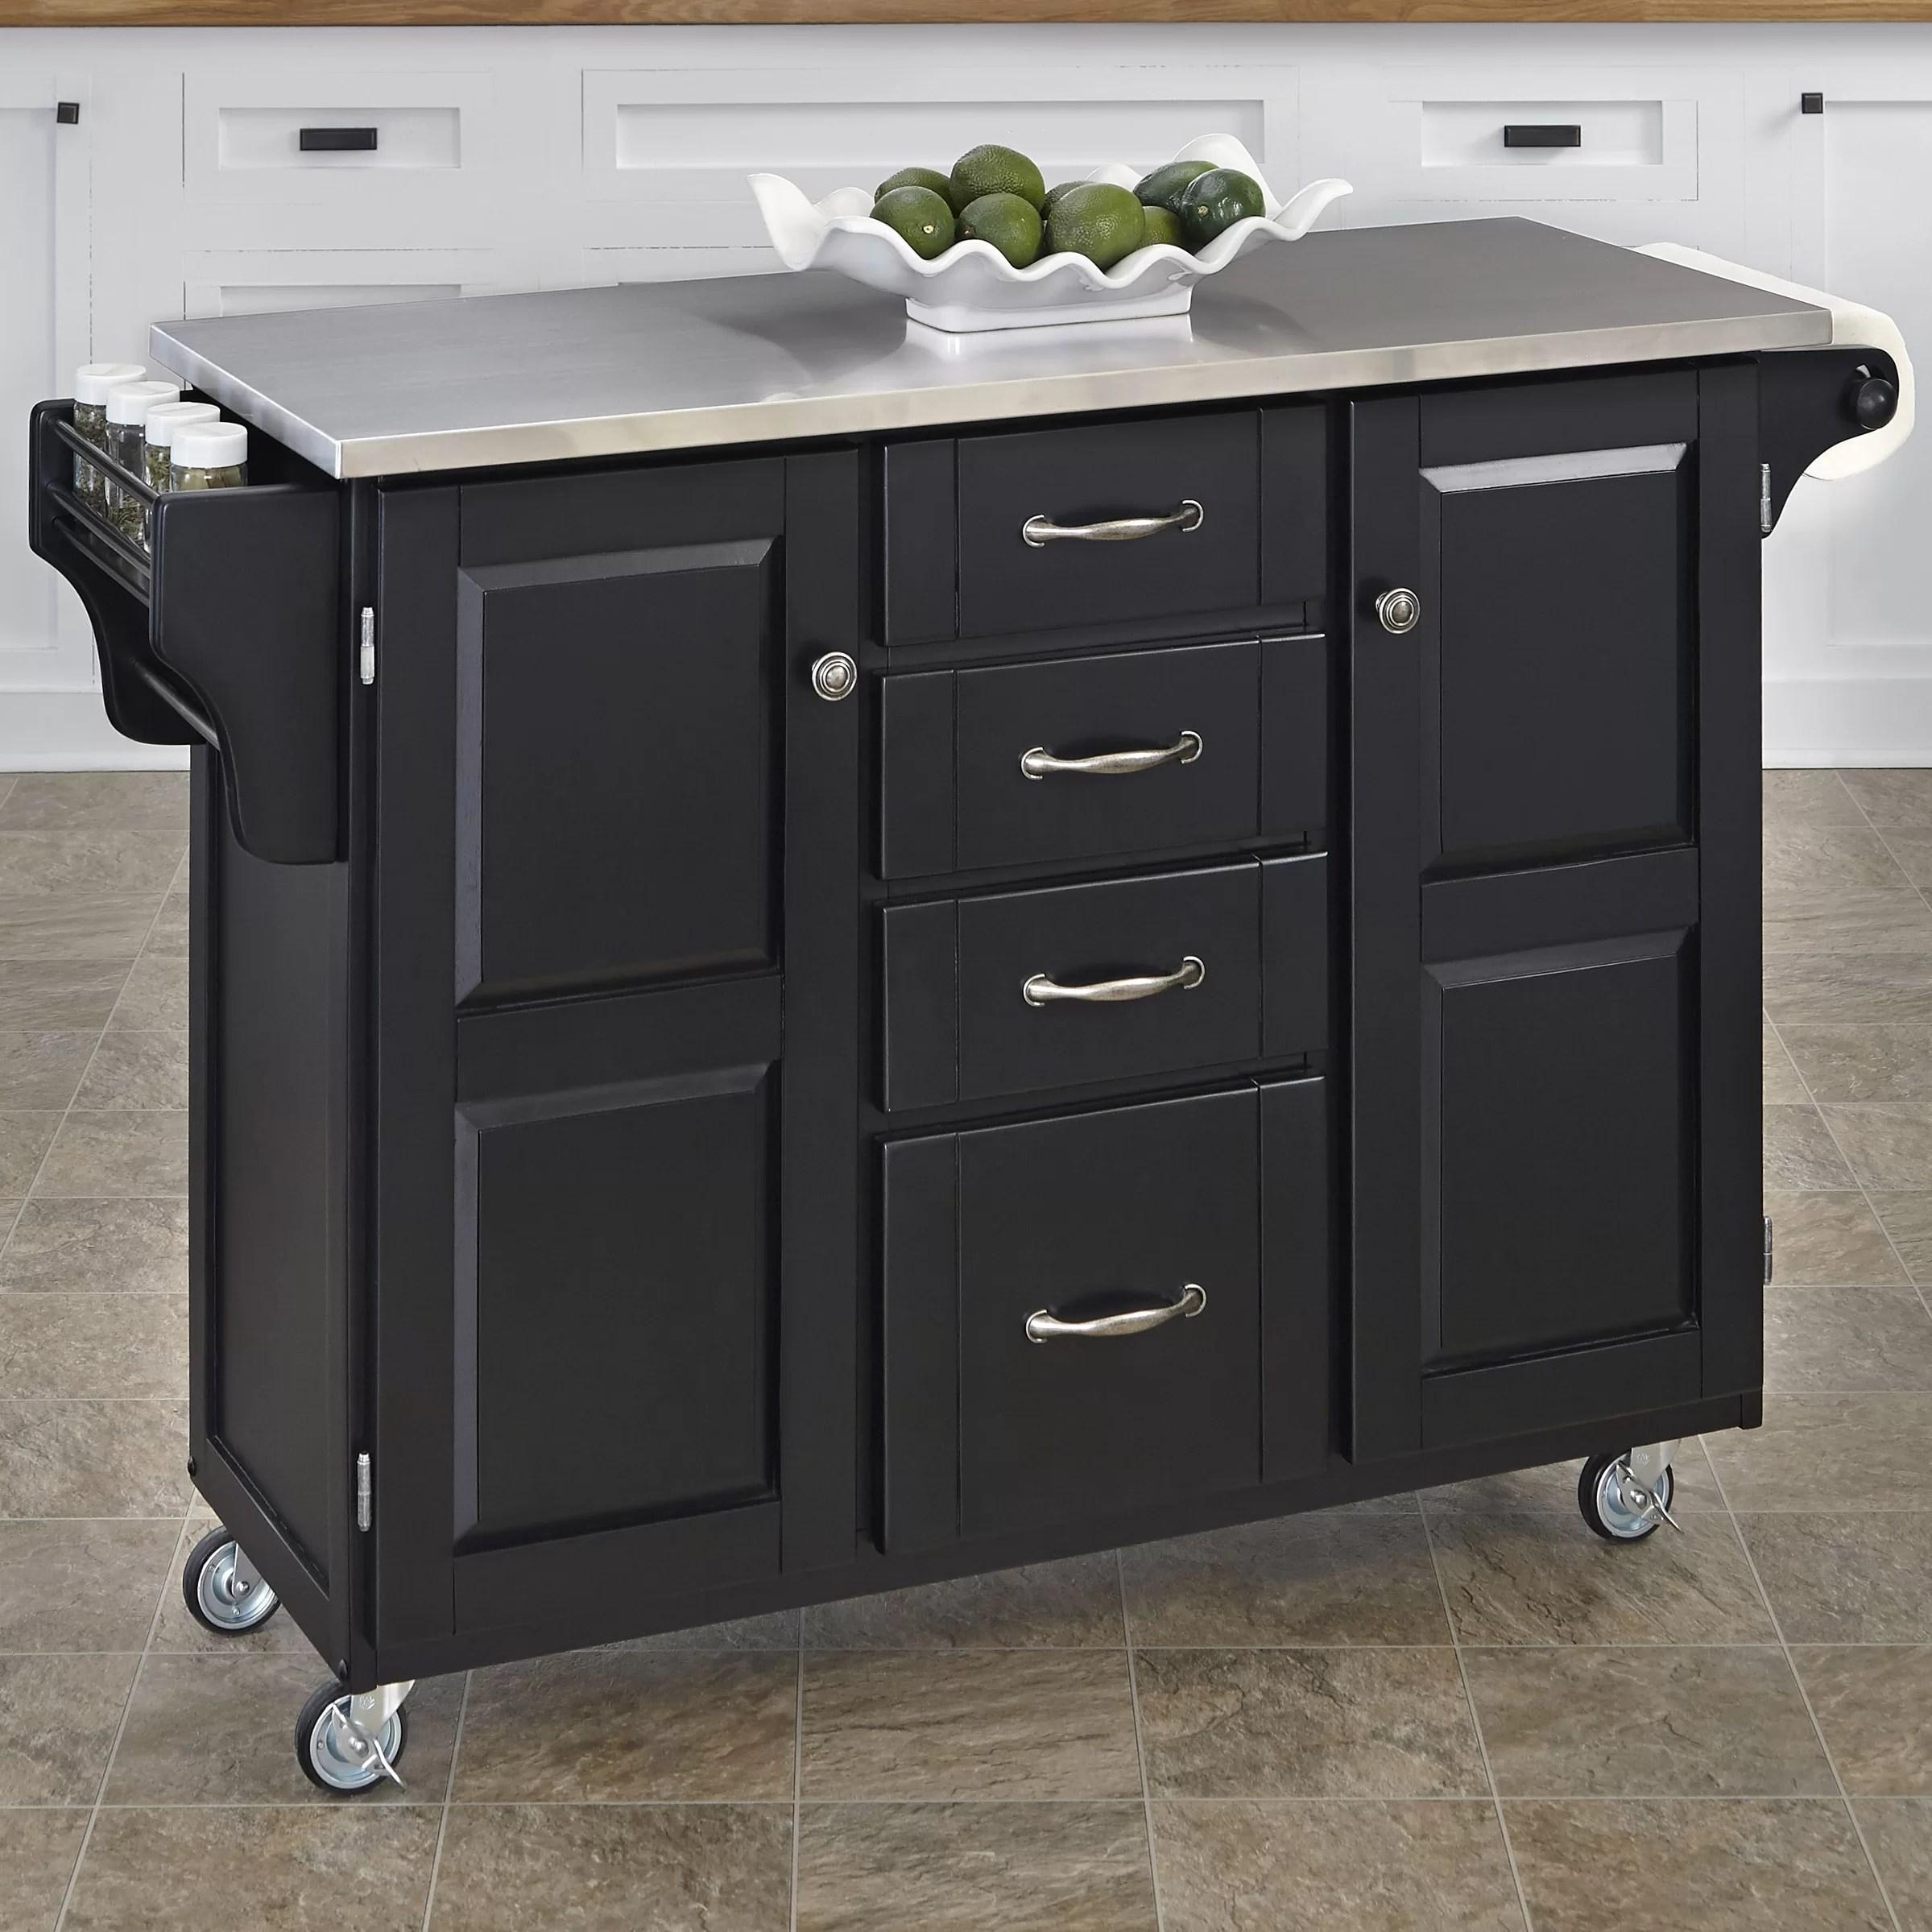 furniture kitchen dining furniture kitchen islands carts home furniture cambridge stainless steel top kitchen island white